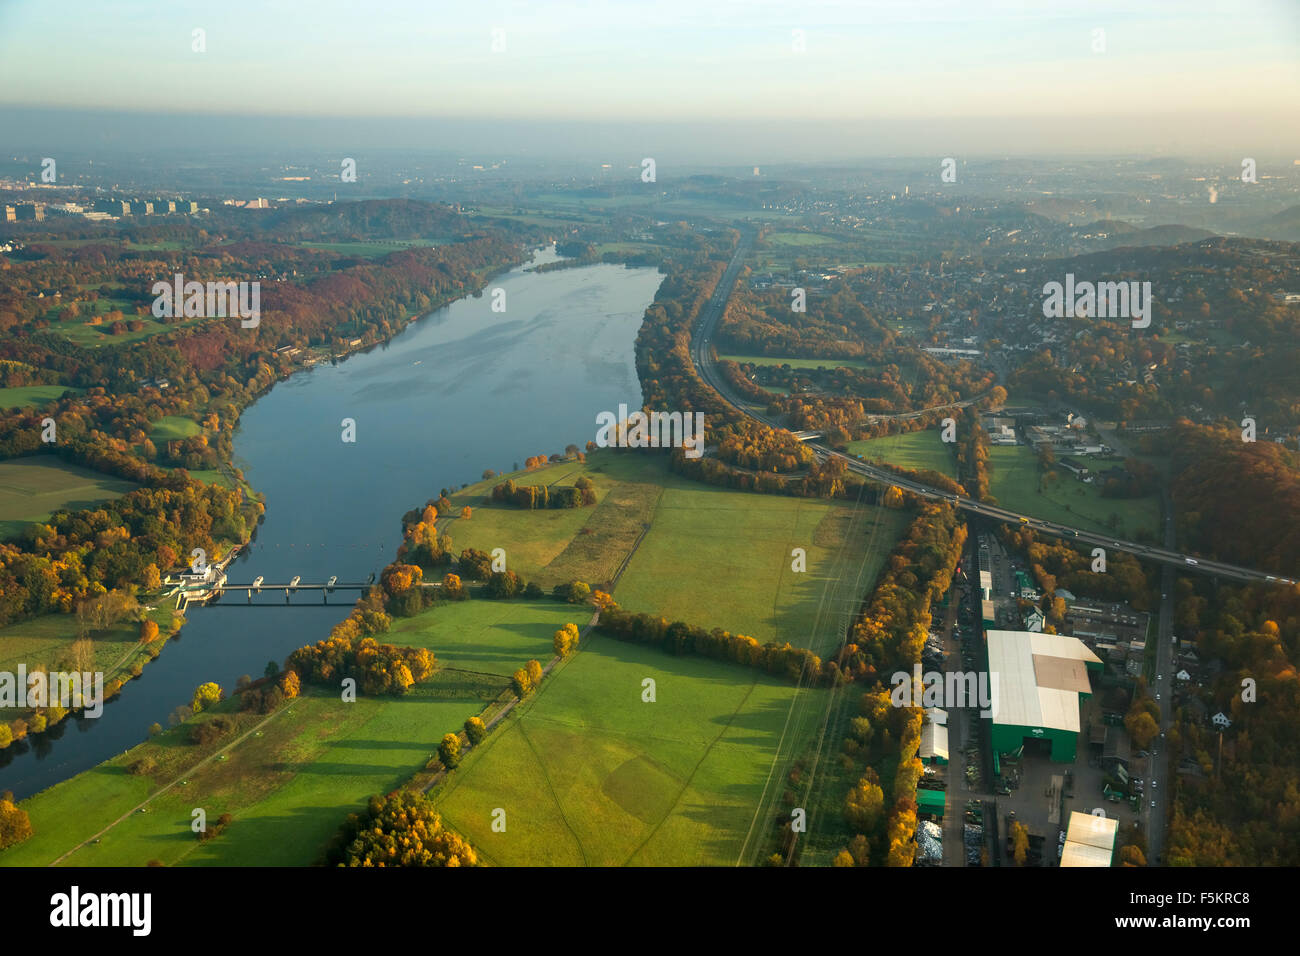 Kemnader Stausee, Lake Kemnade, river Ruhr, Kemnader Reservoir in autumn light, Witten, Ruhr Aeria - Stock Image